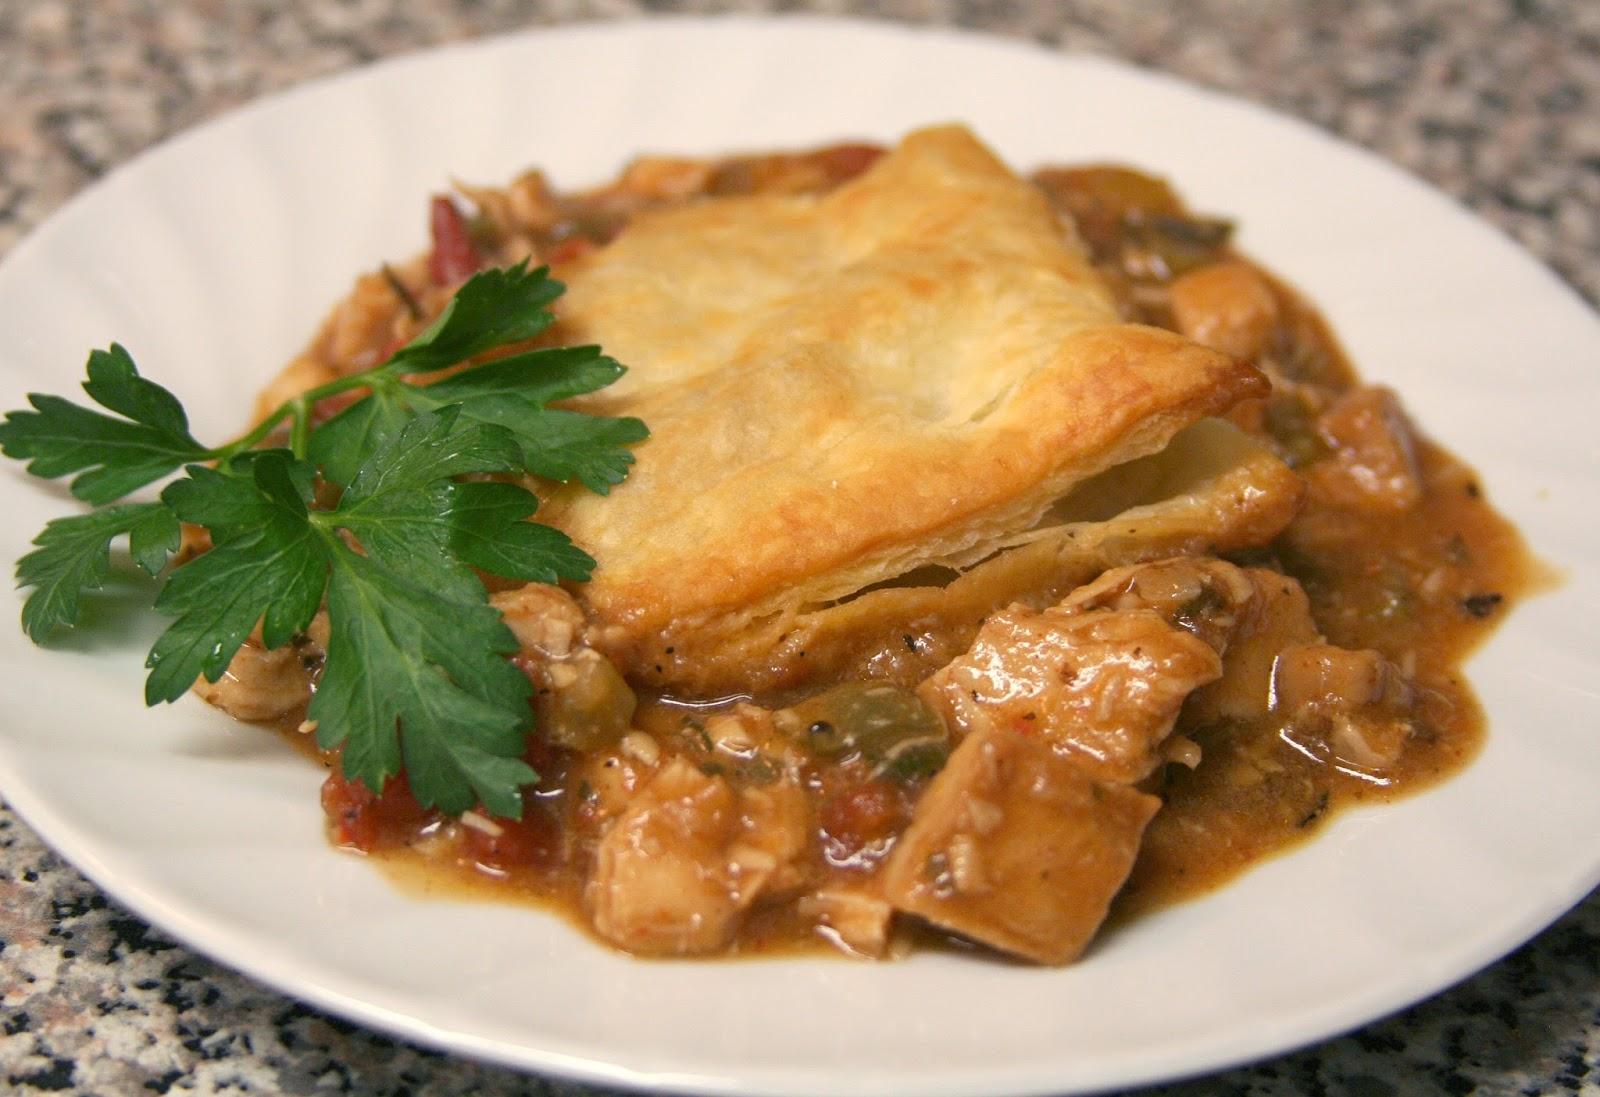 Culturally Confused: Simply Recipes: Cajun Turkey Pot Pie